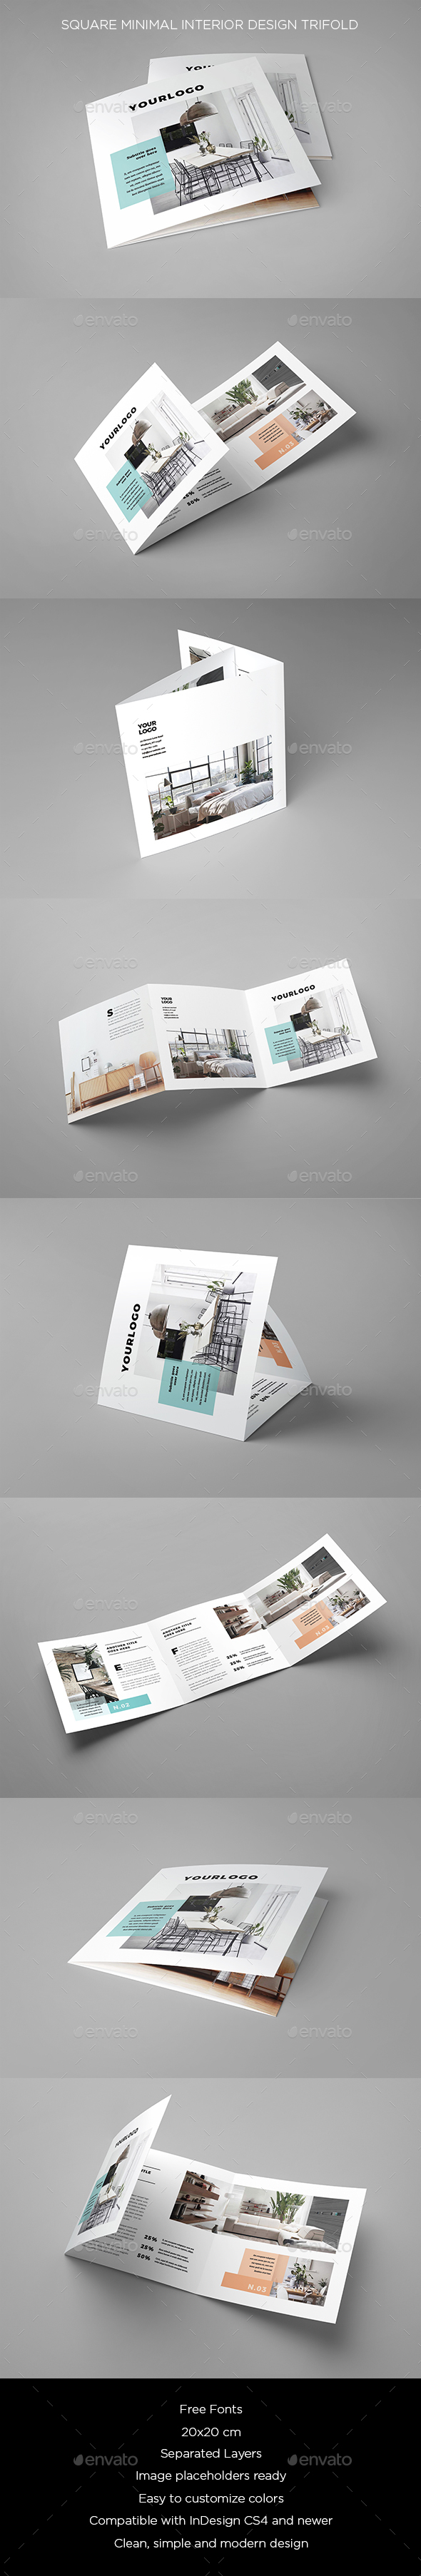 Square Minimal Interior Design Trifold - Brochures Print Templates